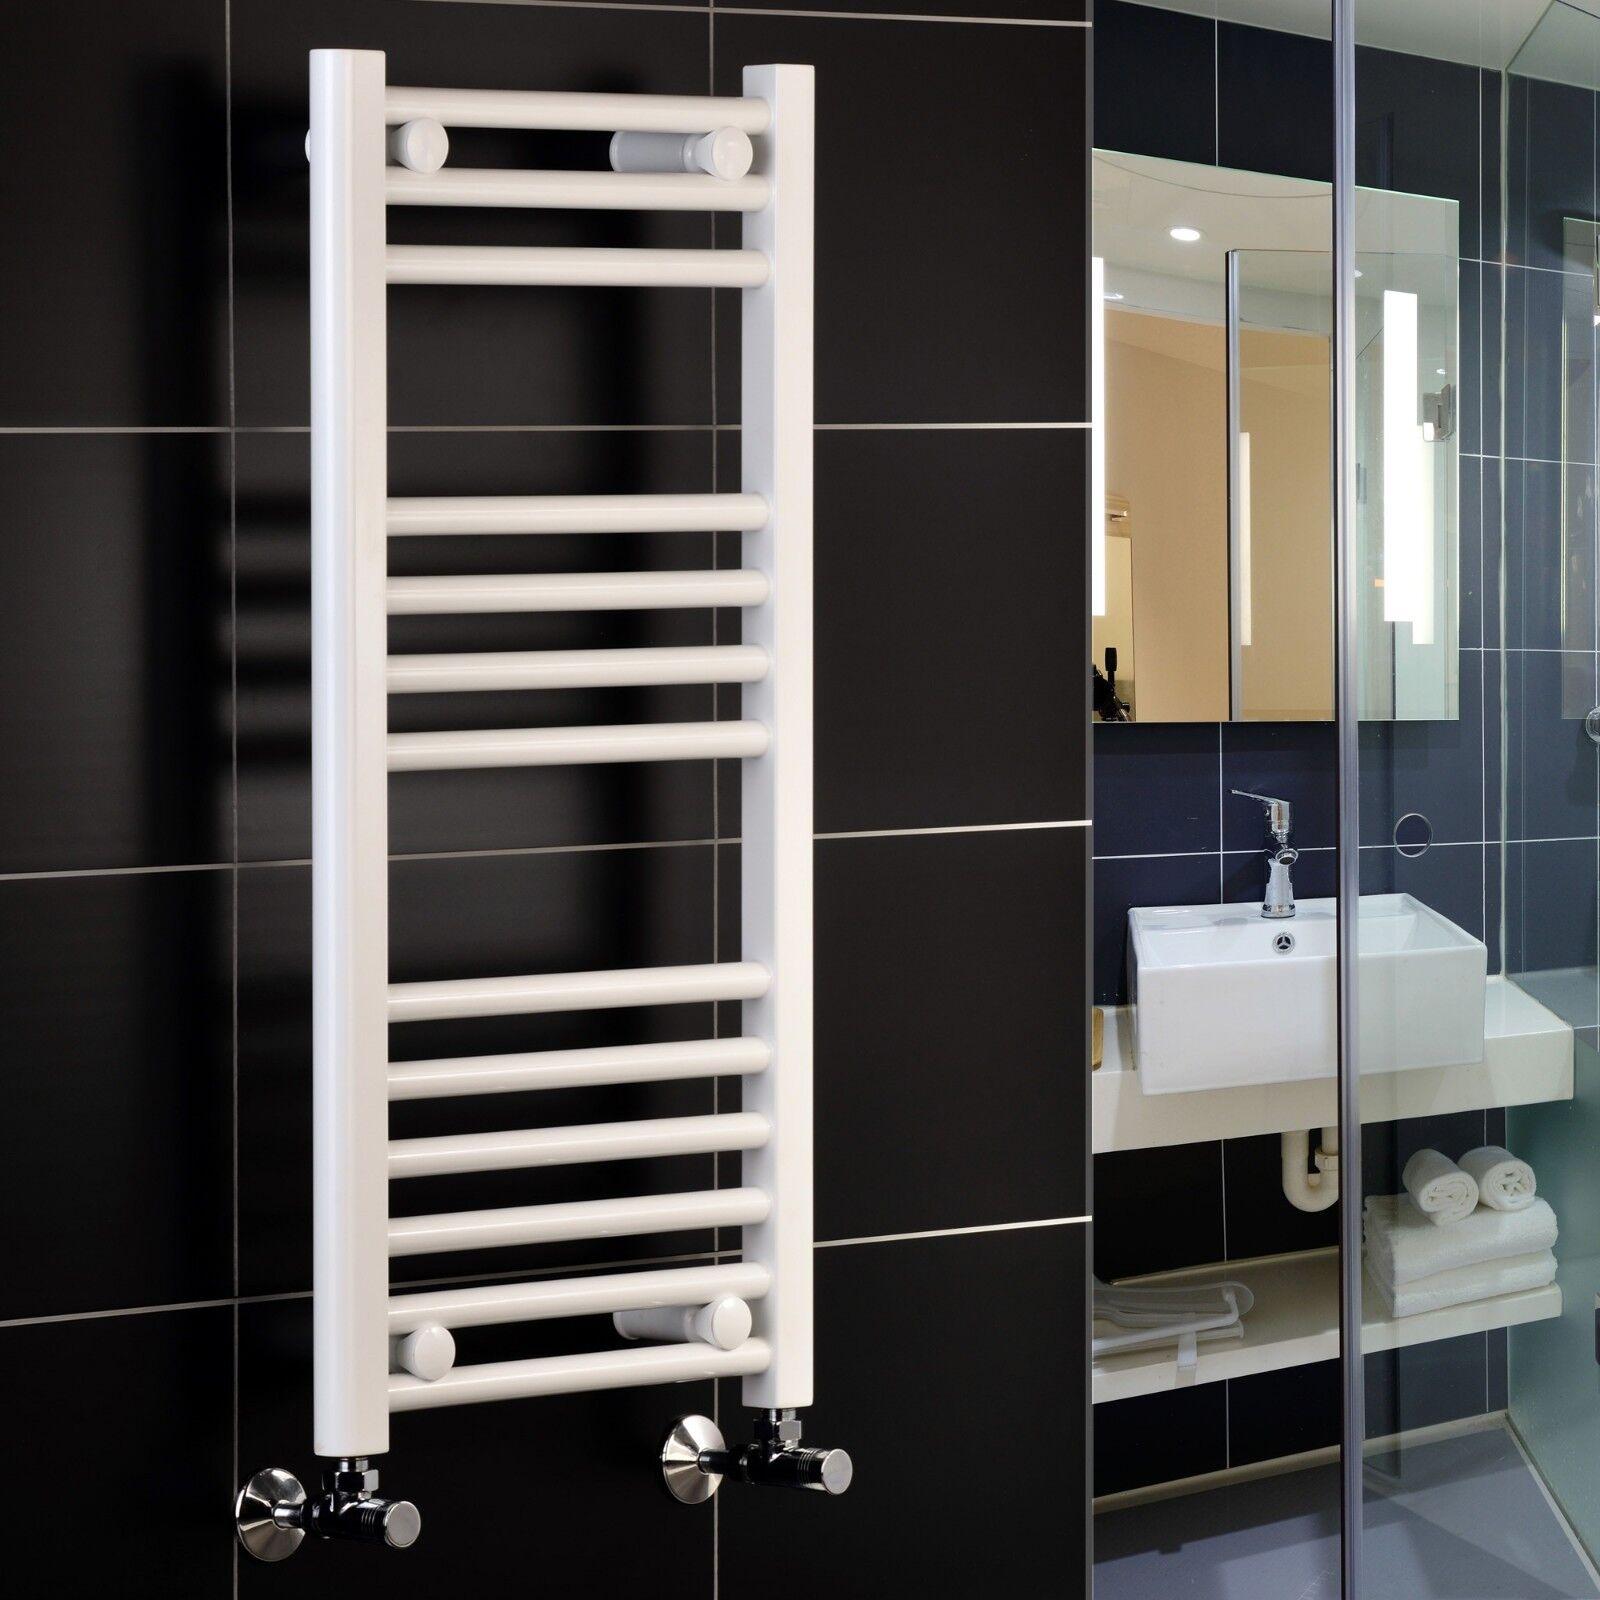 Weiß Heated Towel Rail Towel Warmer 400mm 500mm 600mm wide Central Heating